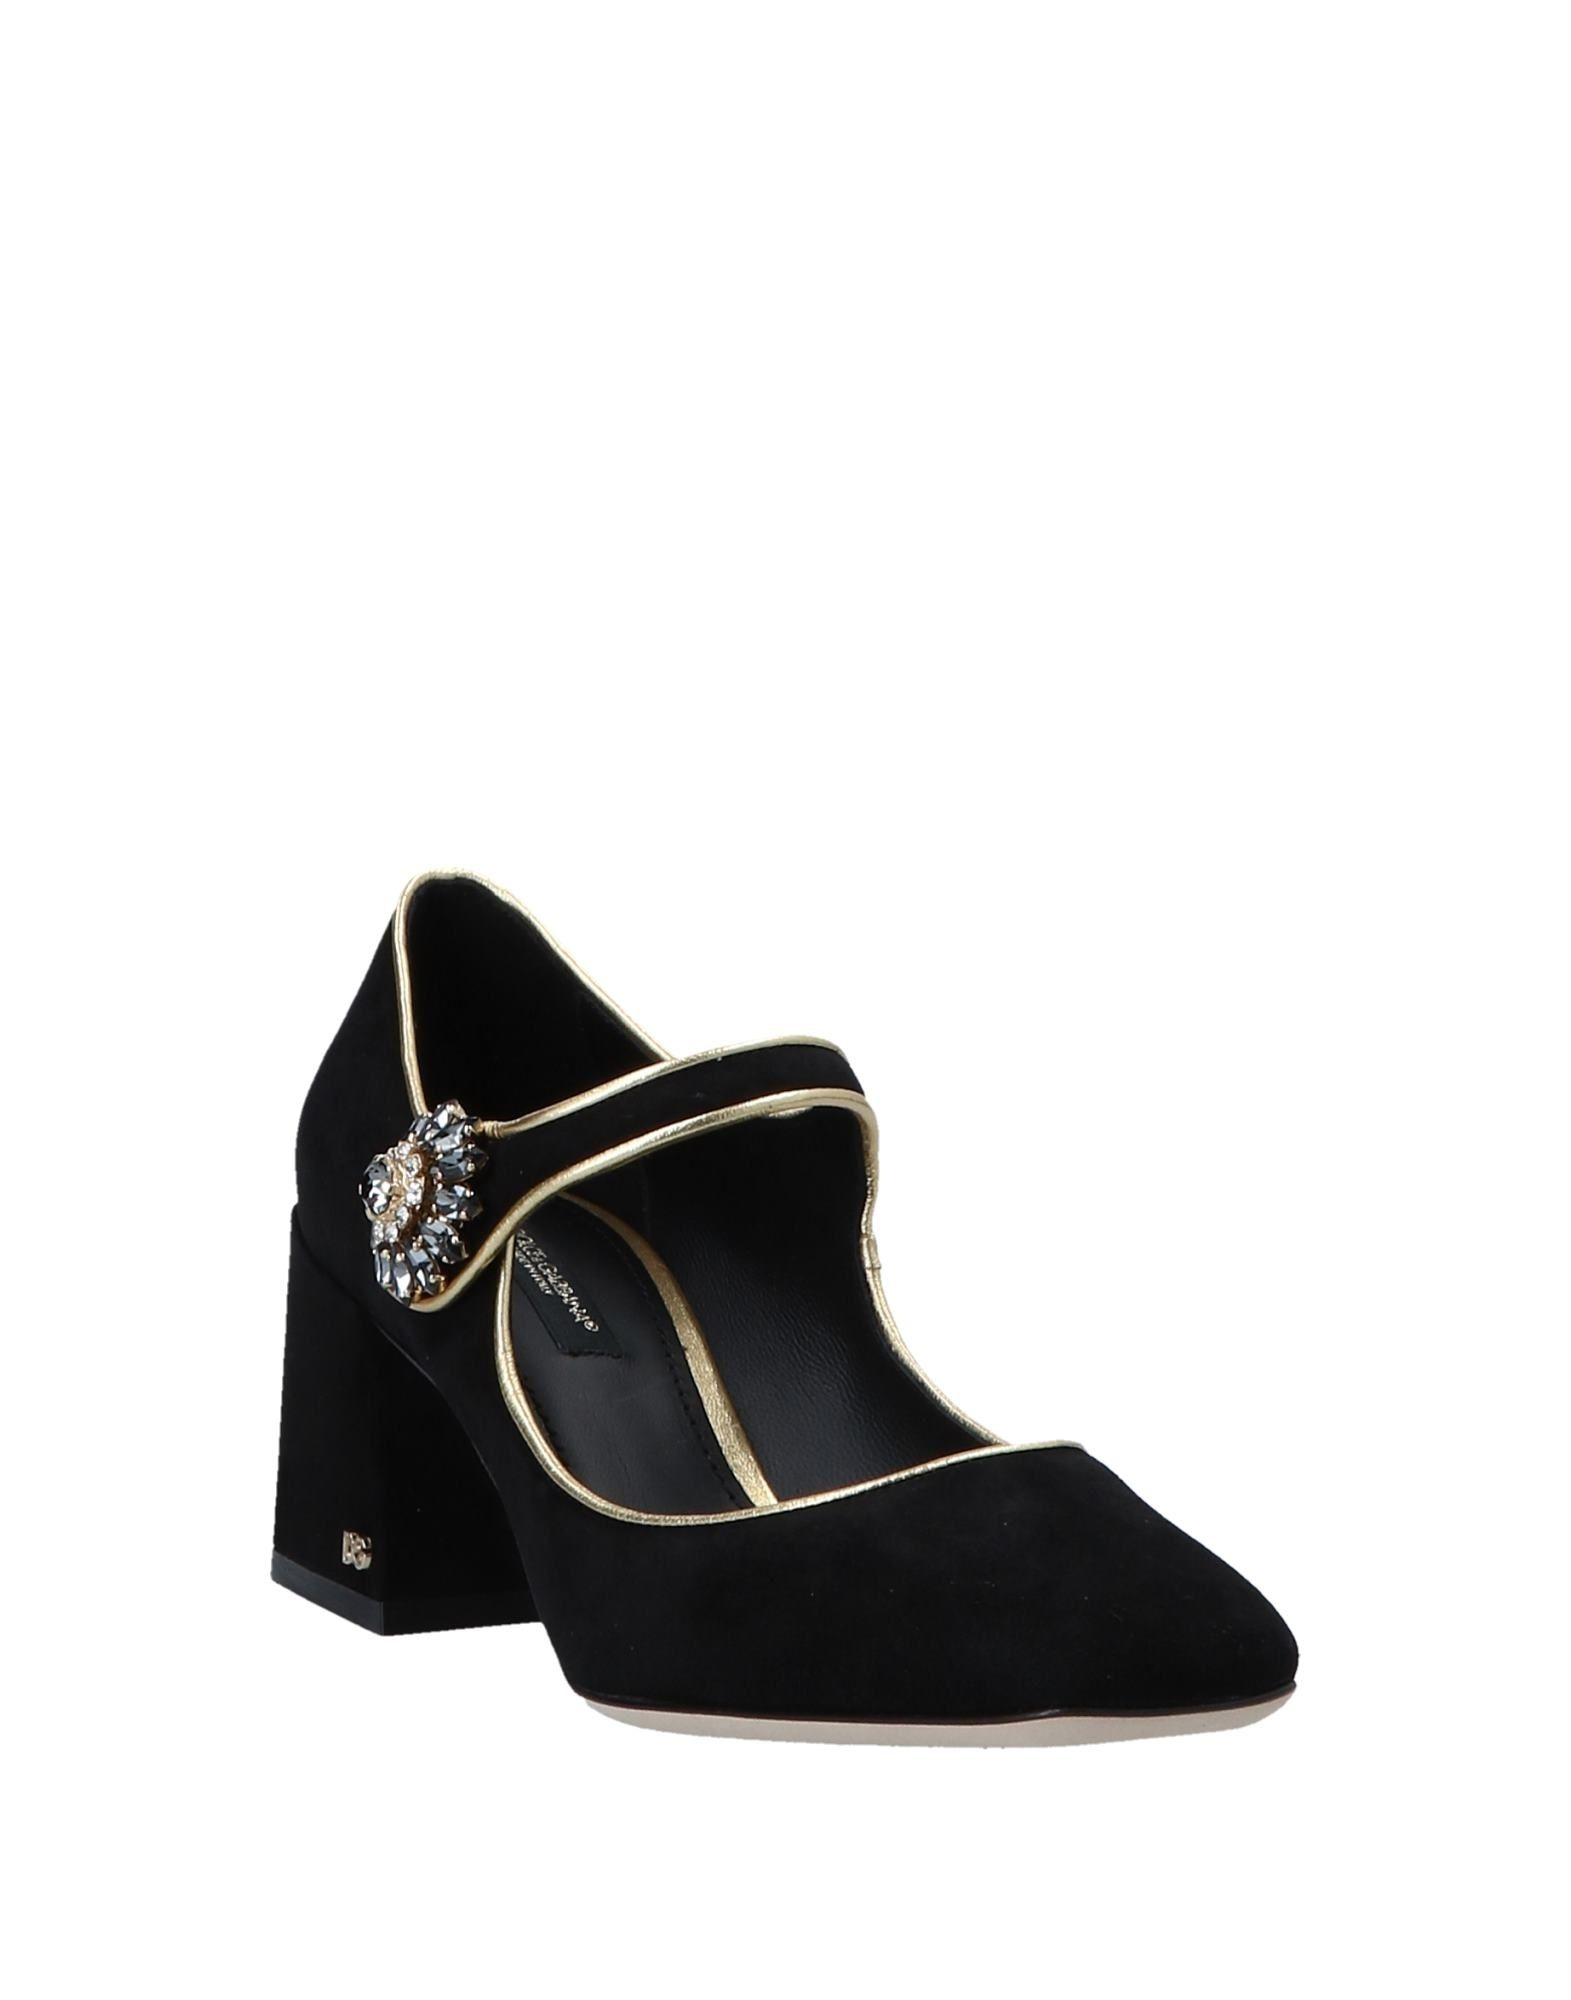 Dolce & Gabbana Pumps aussehende Damen  11528206XQGünstige gut aussehende Pumps Schuhe 7fe2a8